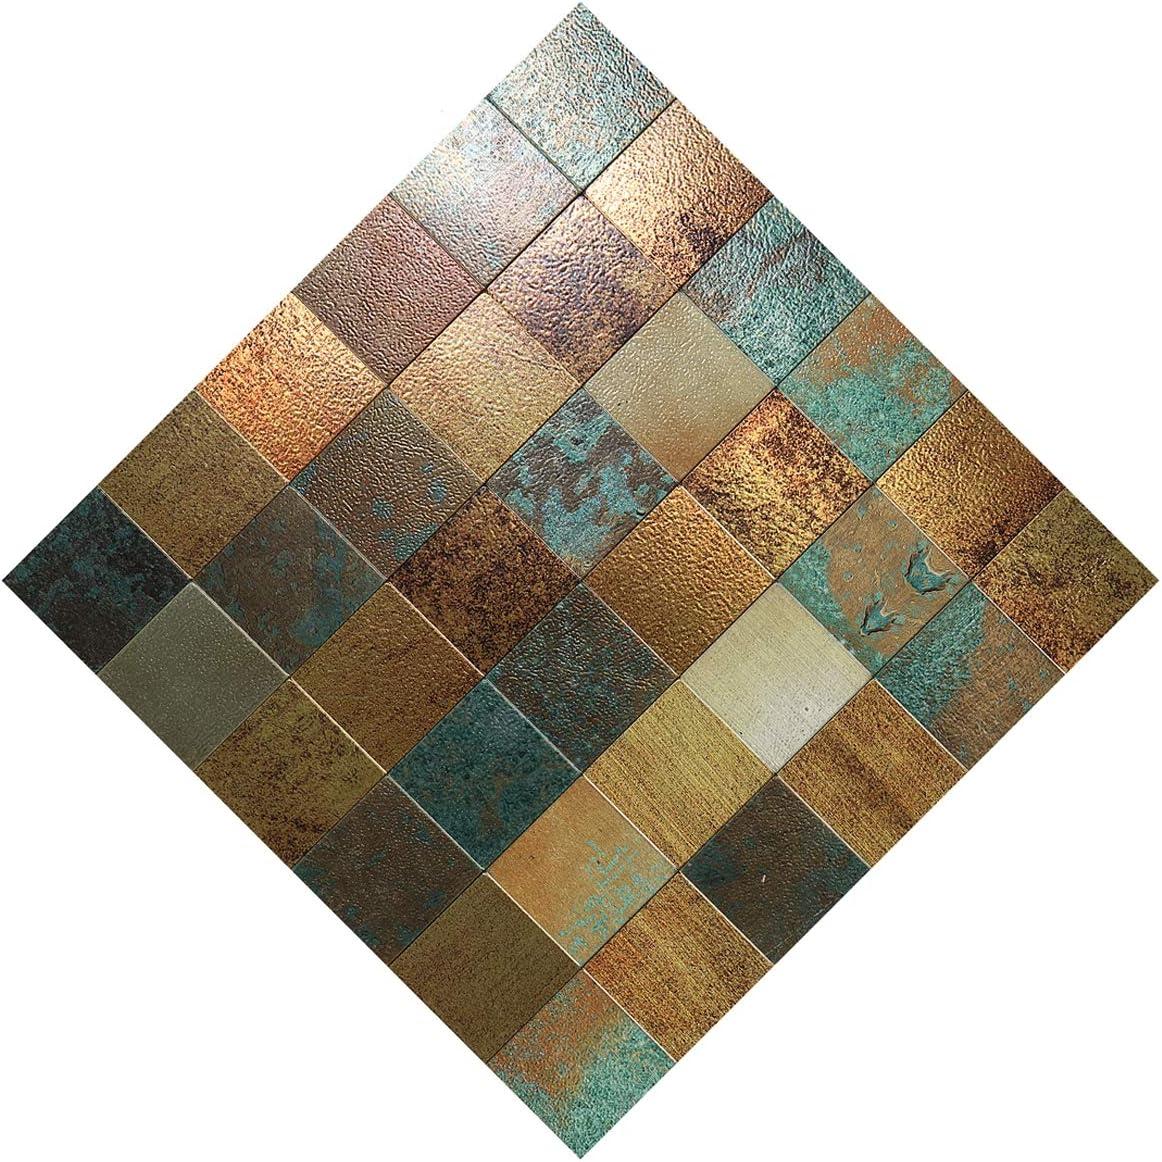 "HomeyMosaic Peel and Stick Tile Backsplash Stick on Kitchen Wall Decor Aluminum Surface Metal Mosaic Smart Tiles Sticker,Square Plaid Imitation Rust Classical Retro Bronze(12""x12""x 5 Sheets)"